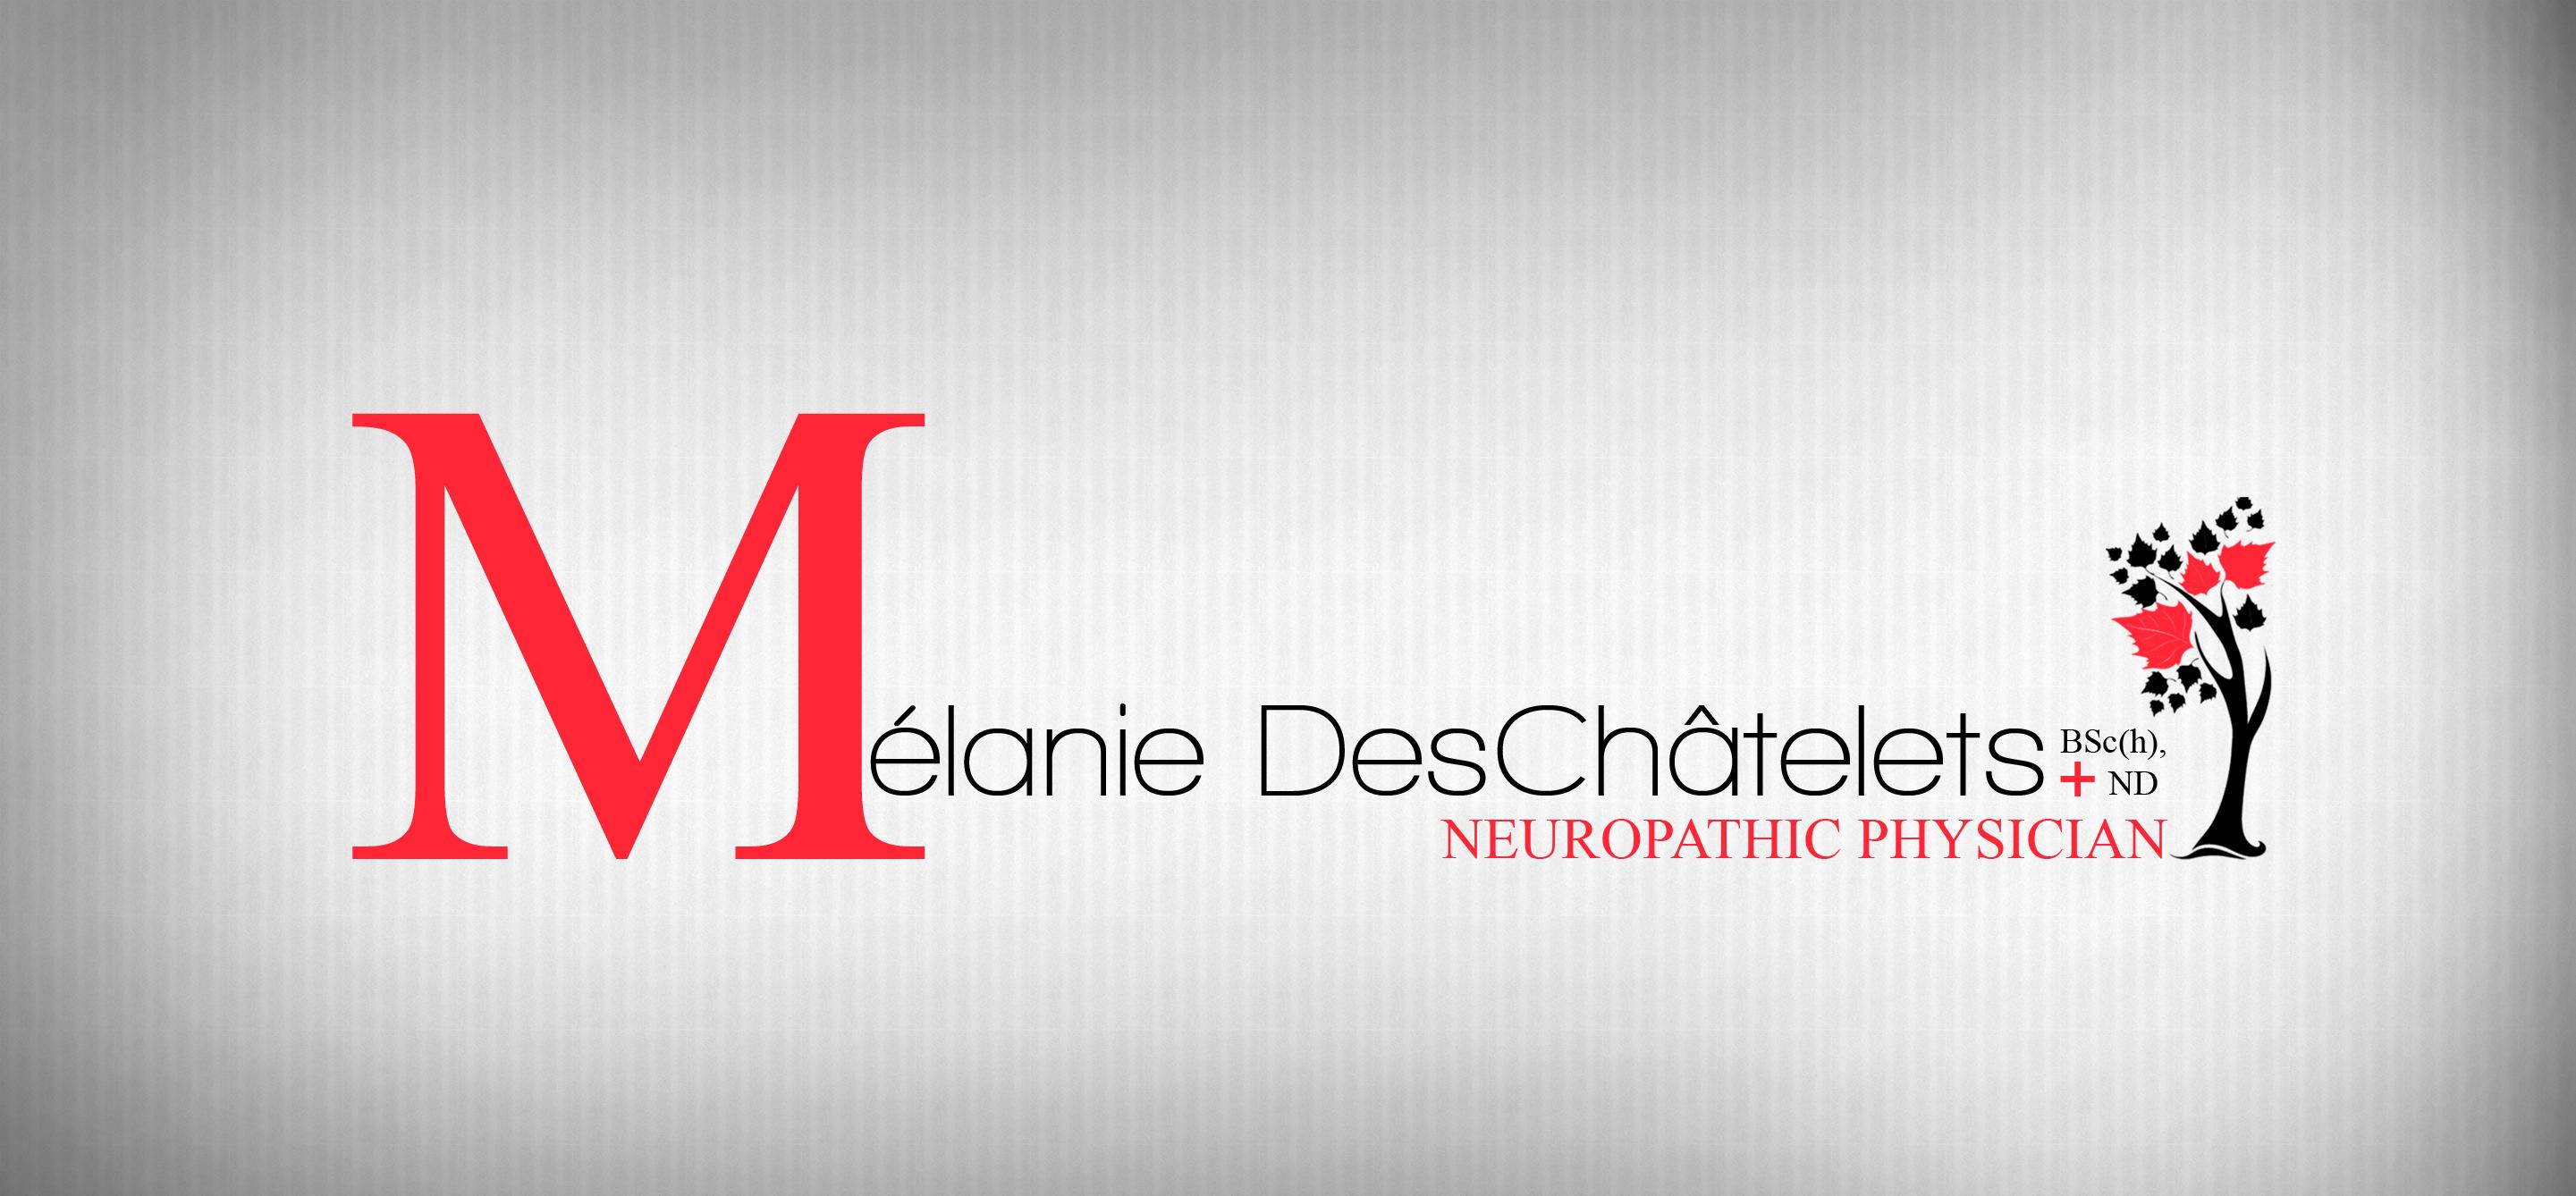 Logo Design by Sandip Kumar - Entry No. 220 in the Logo Design Contest Artistic Logo Design for Dr Mélanie DesChâtelets.